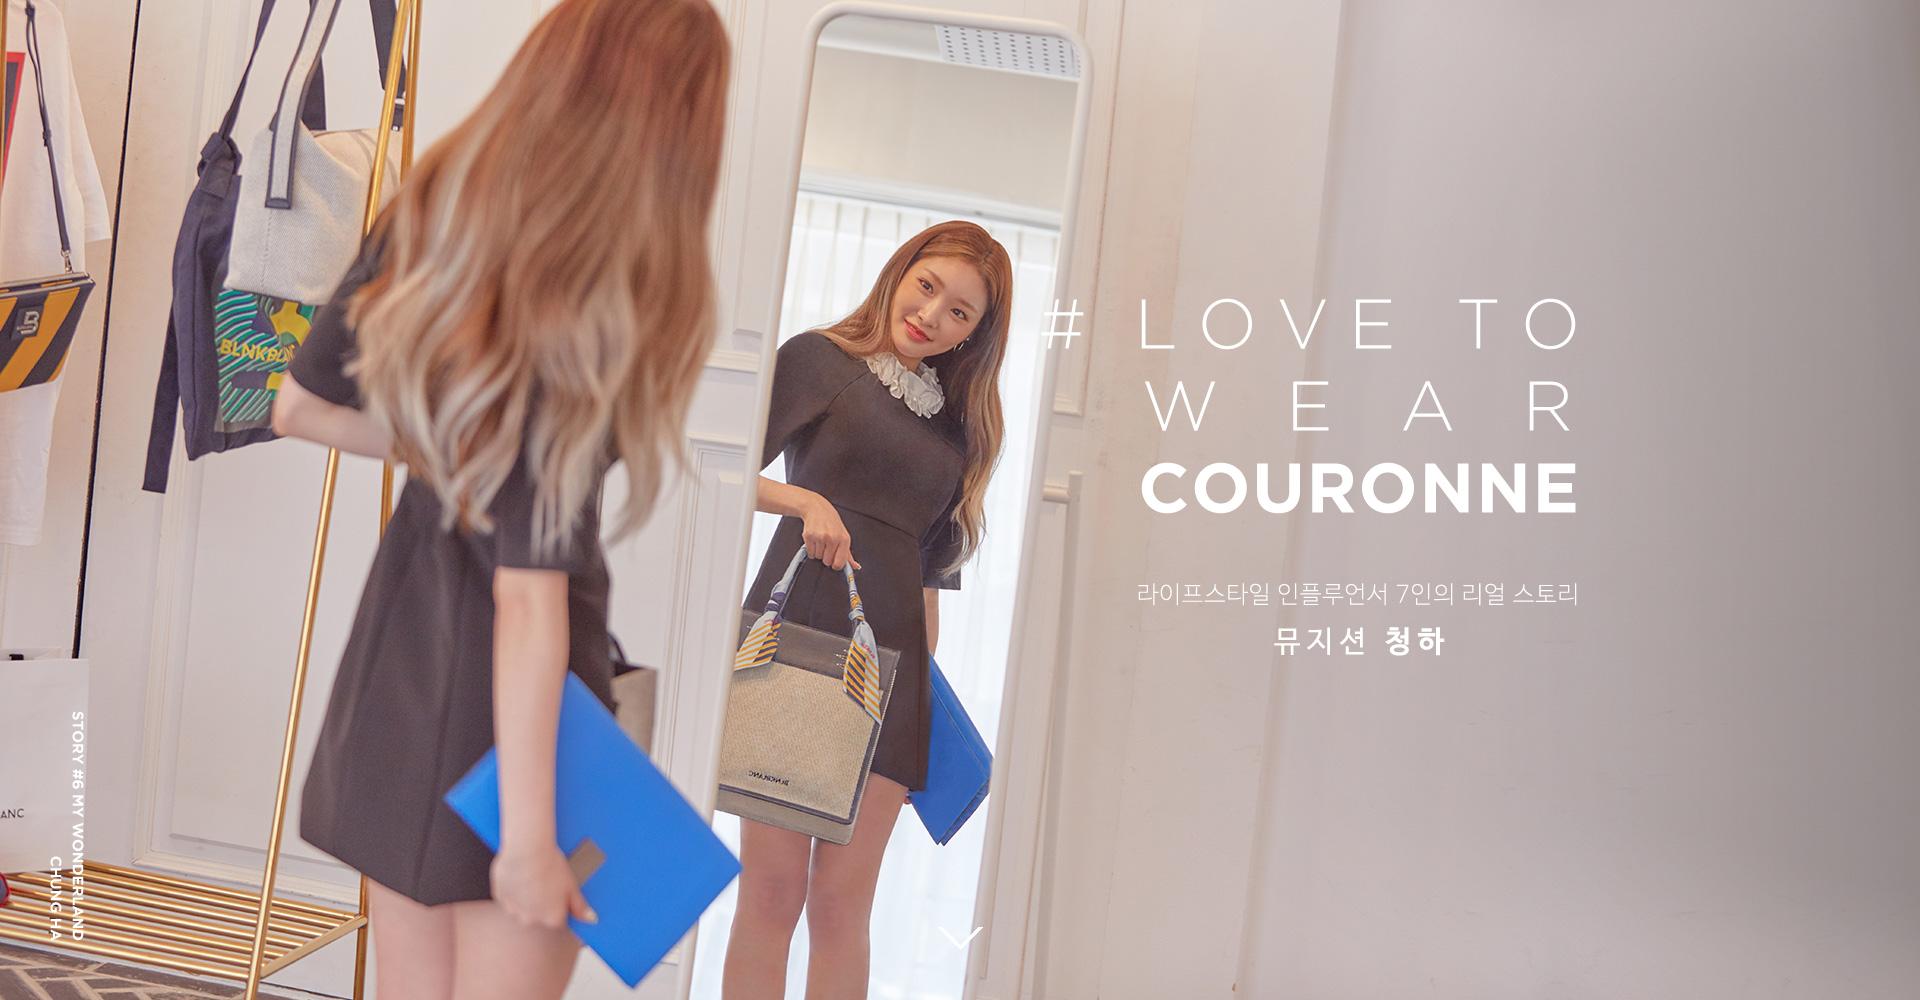 LOVE TO WEAR COURONNE '쿠로니스타 in QUERENCIA' 라이프스타일 인플루언서 7인의 리얼 스토리